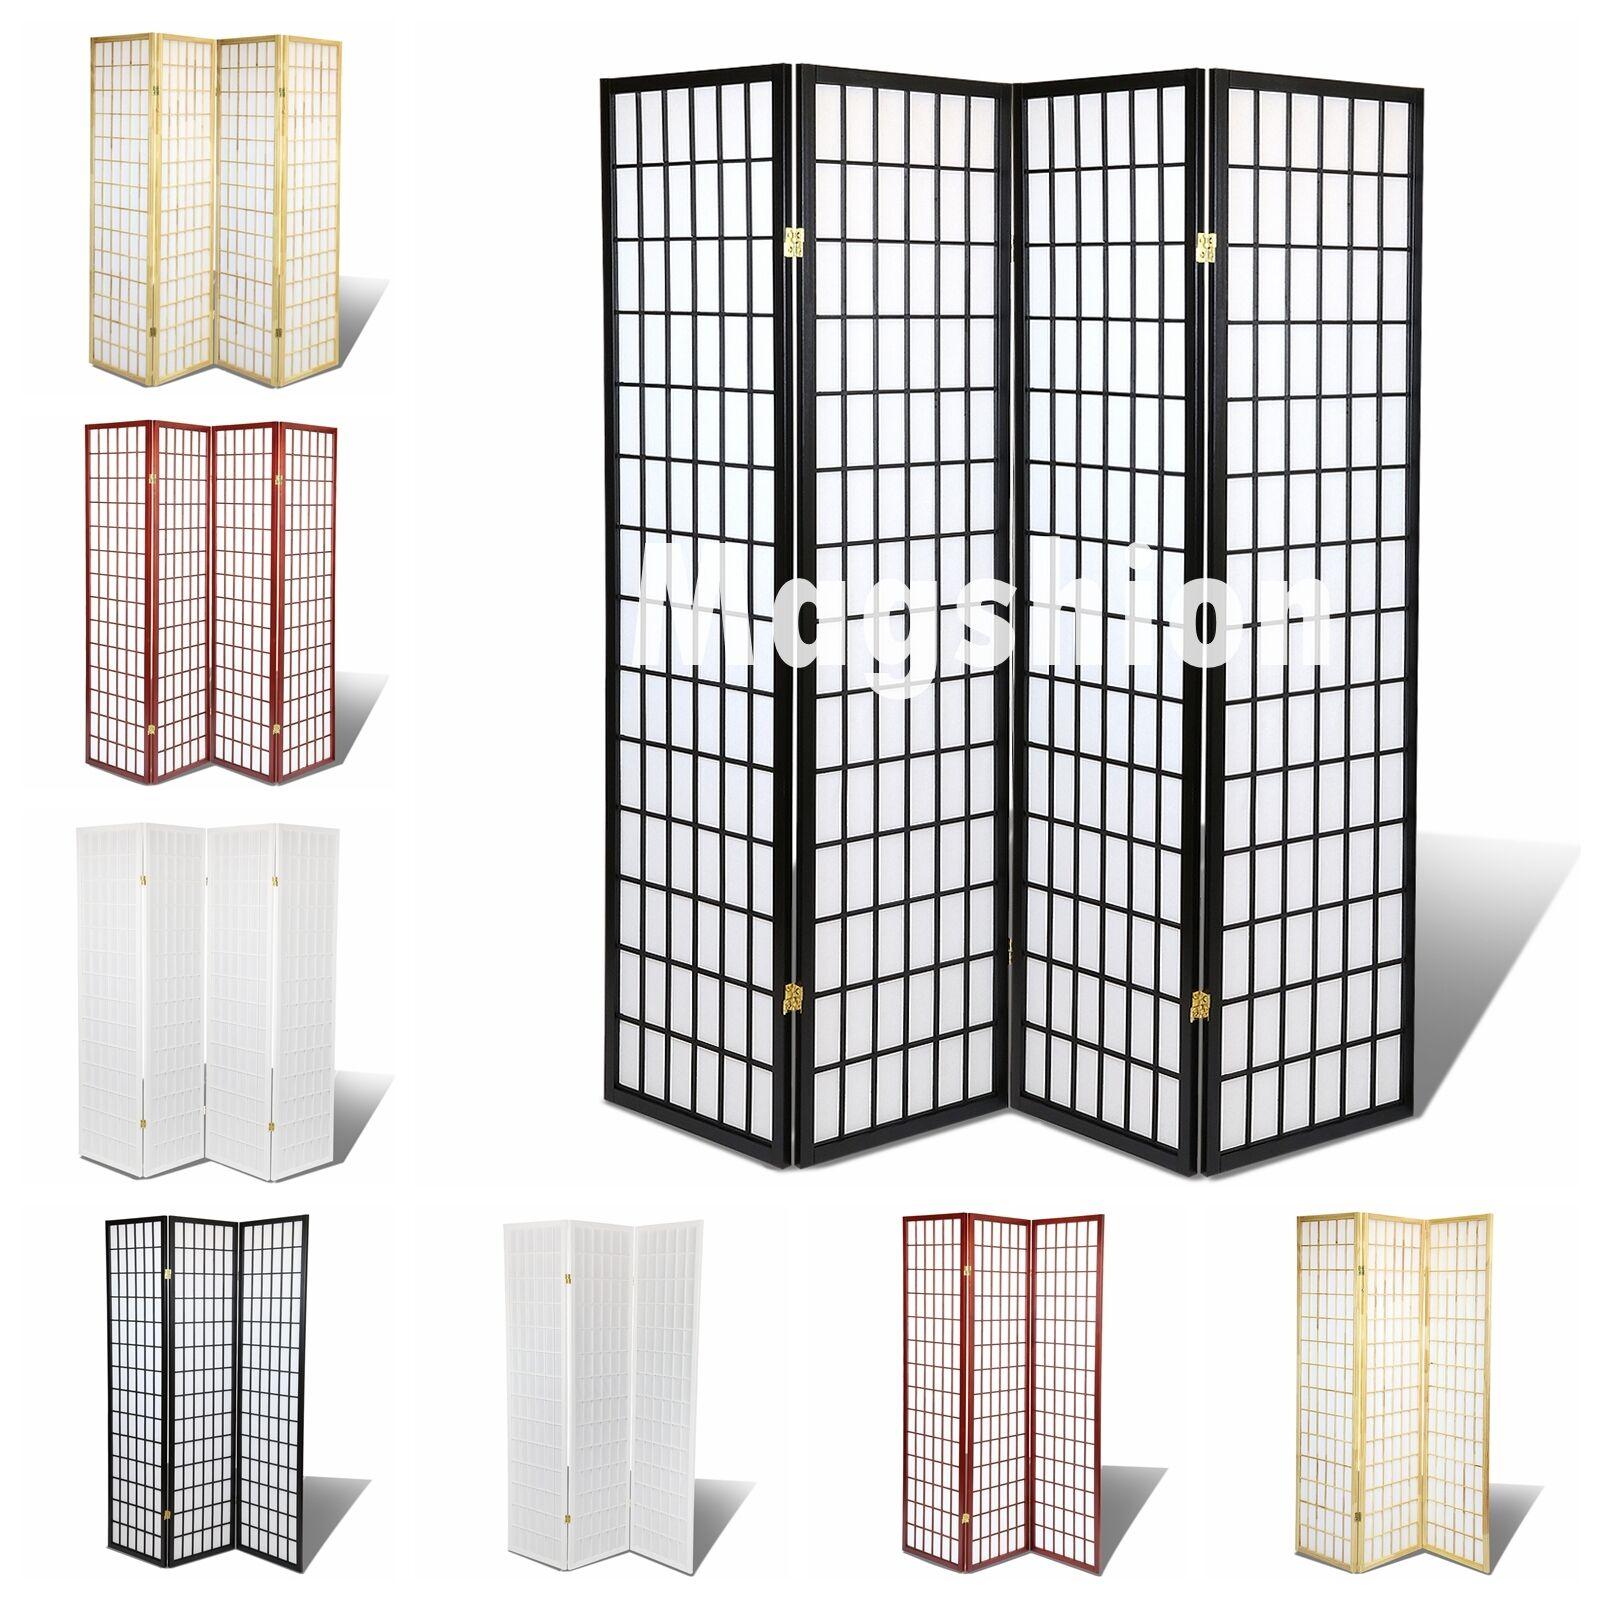 Magshion Oriental Room Divider Hardwood Shoji Screen 4 Panel Blinds Shades-White